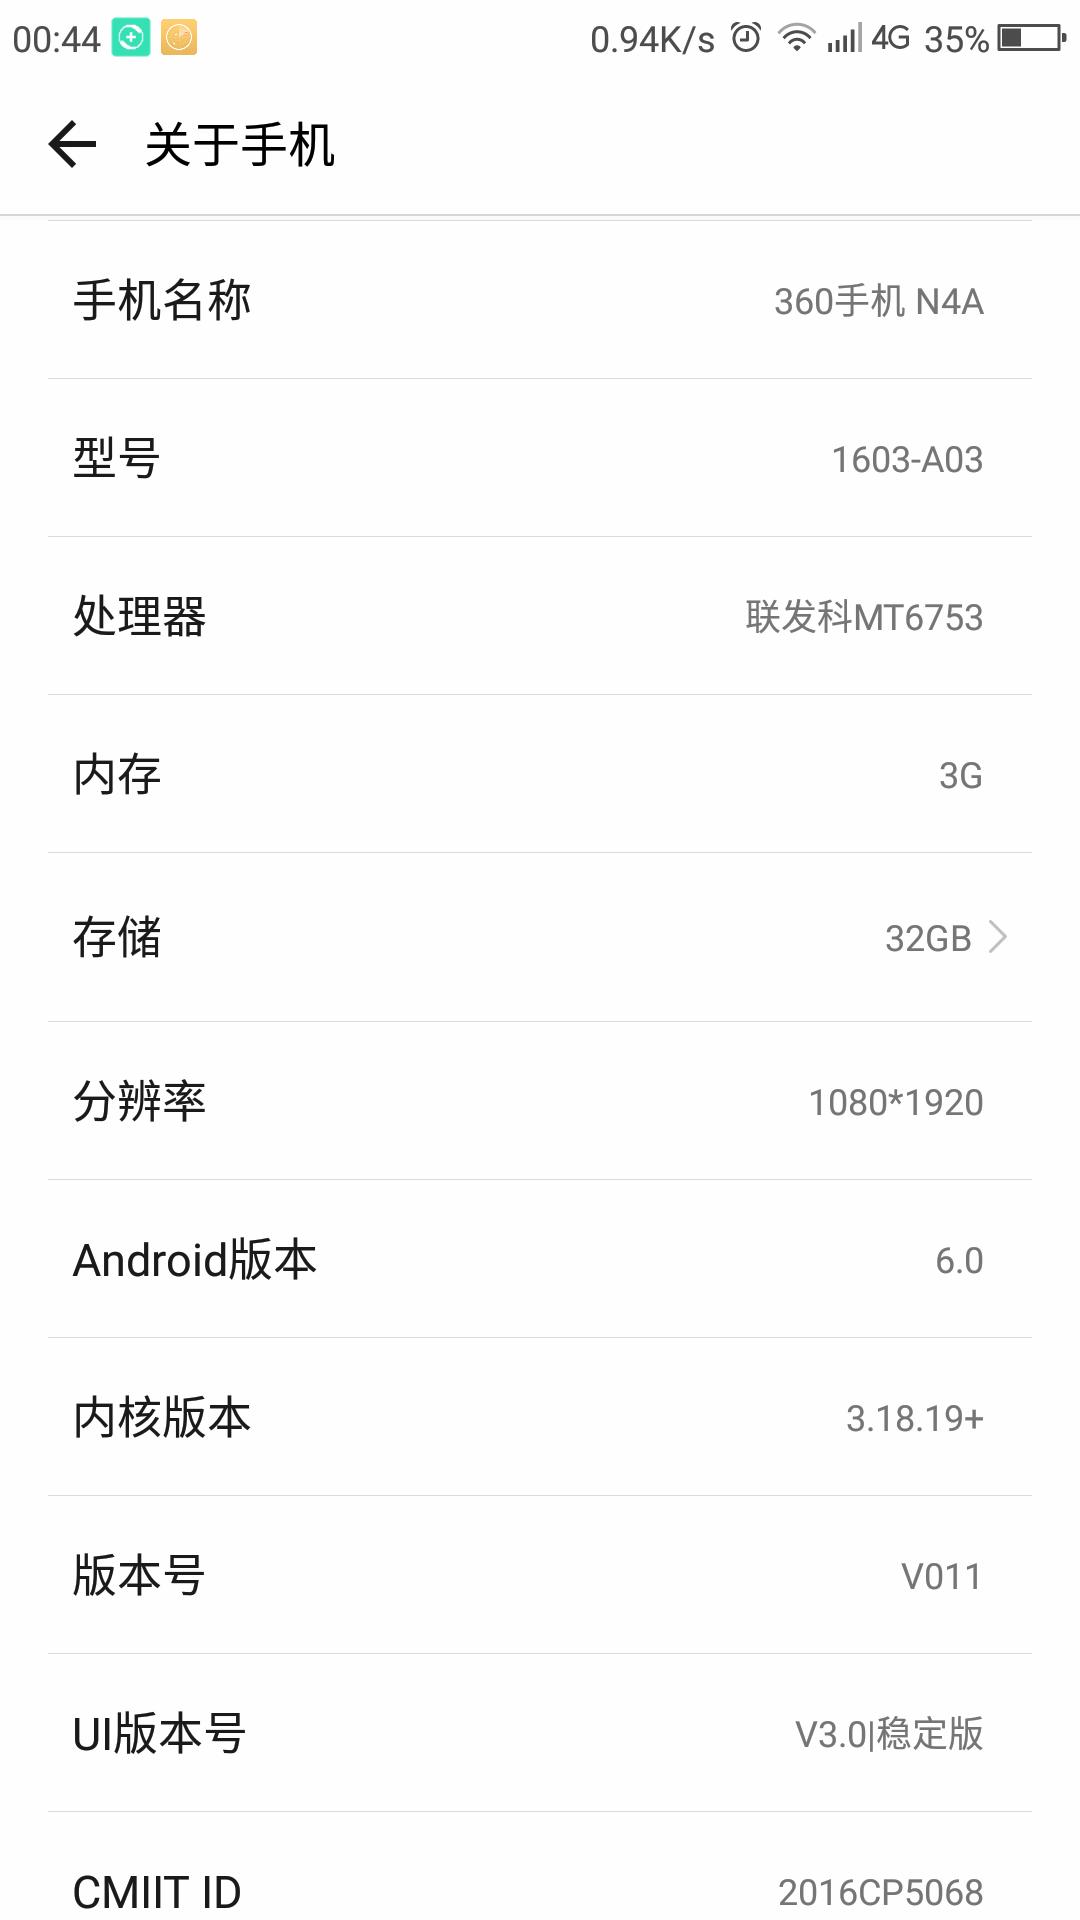 Screenshot_2018-03-03-00-44-12.png